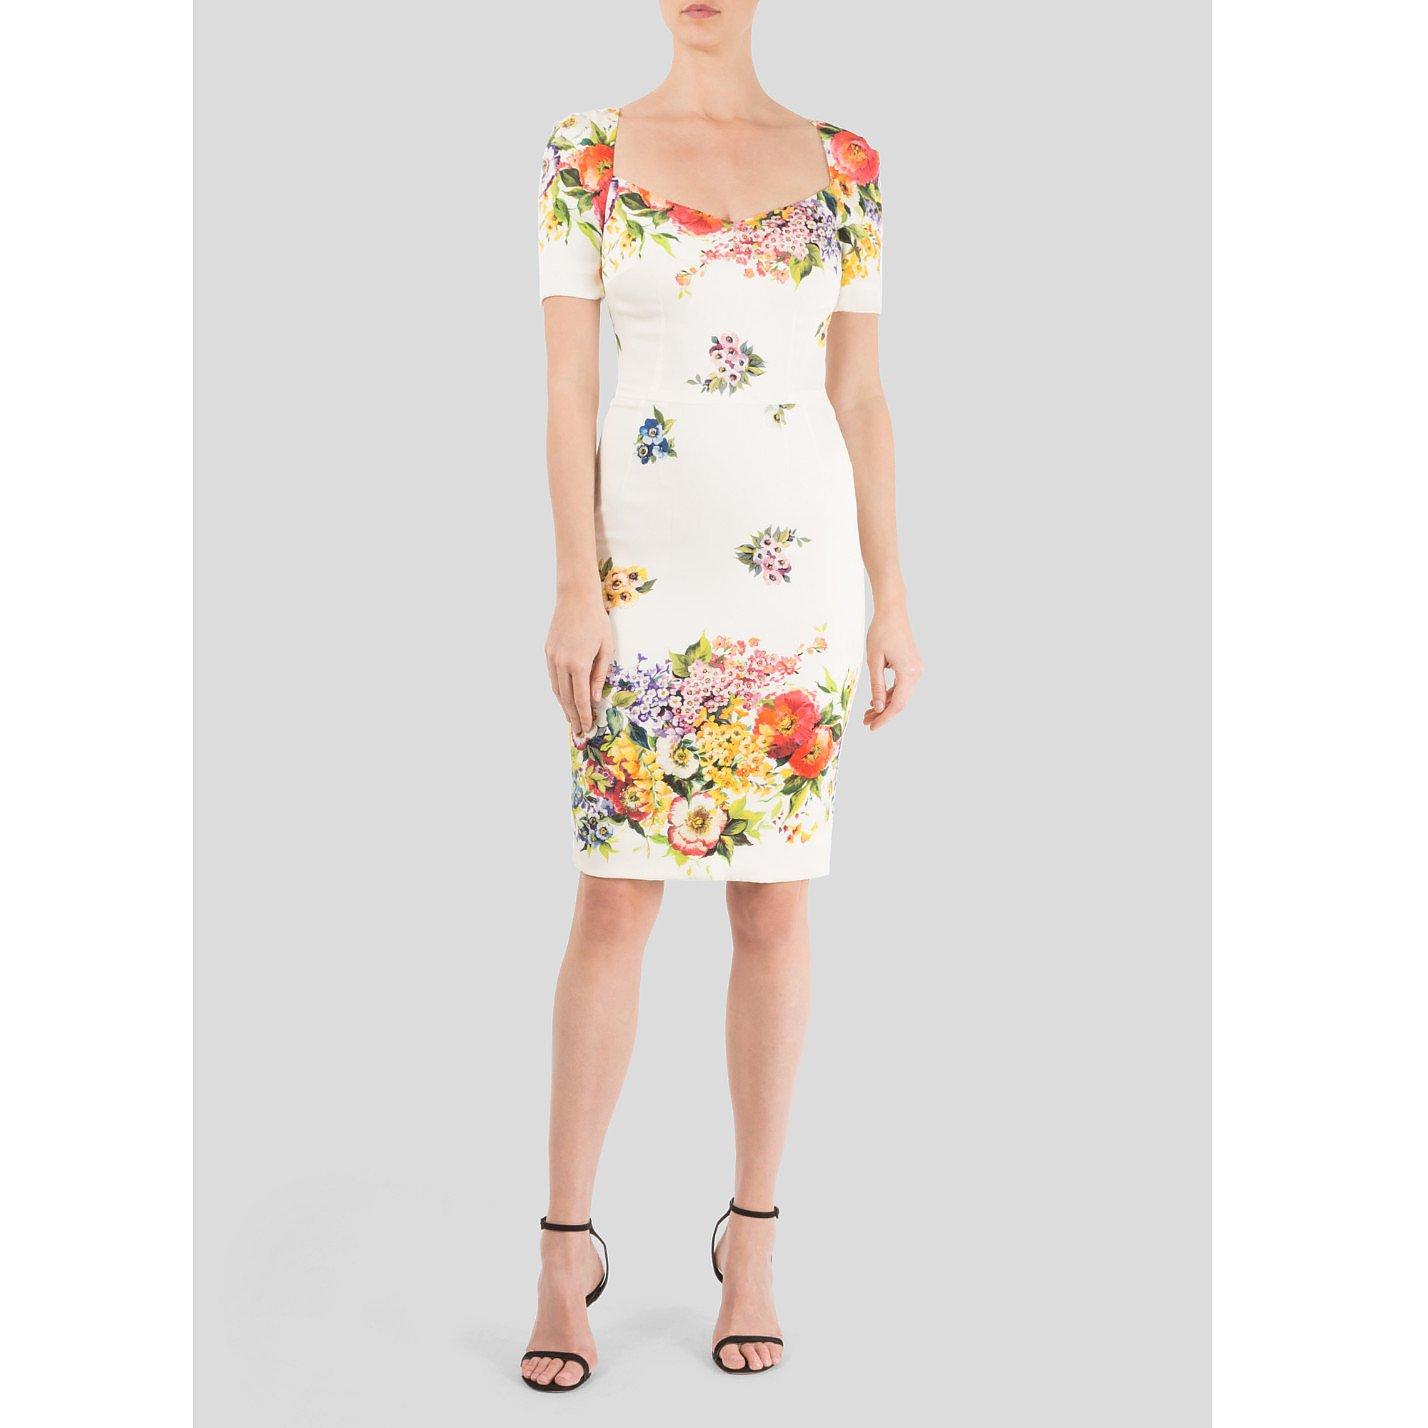 DOLCE & GABBANA Floral-Print Silk Charmeuse Dress